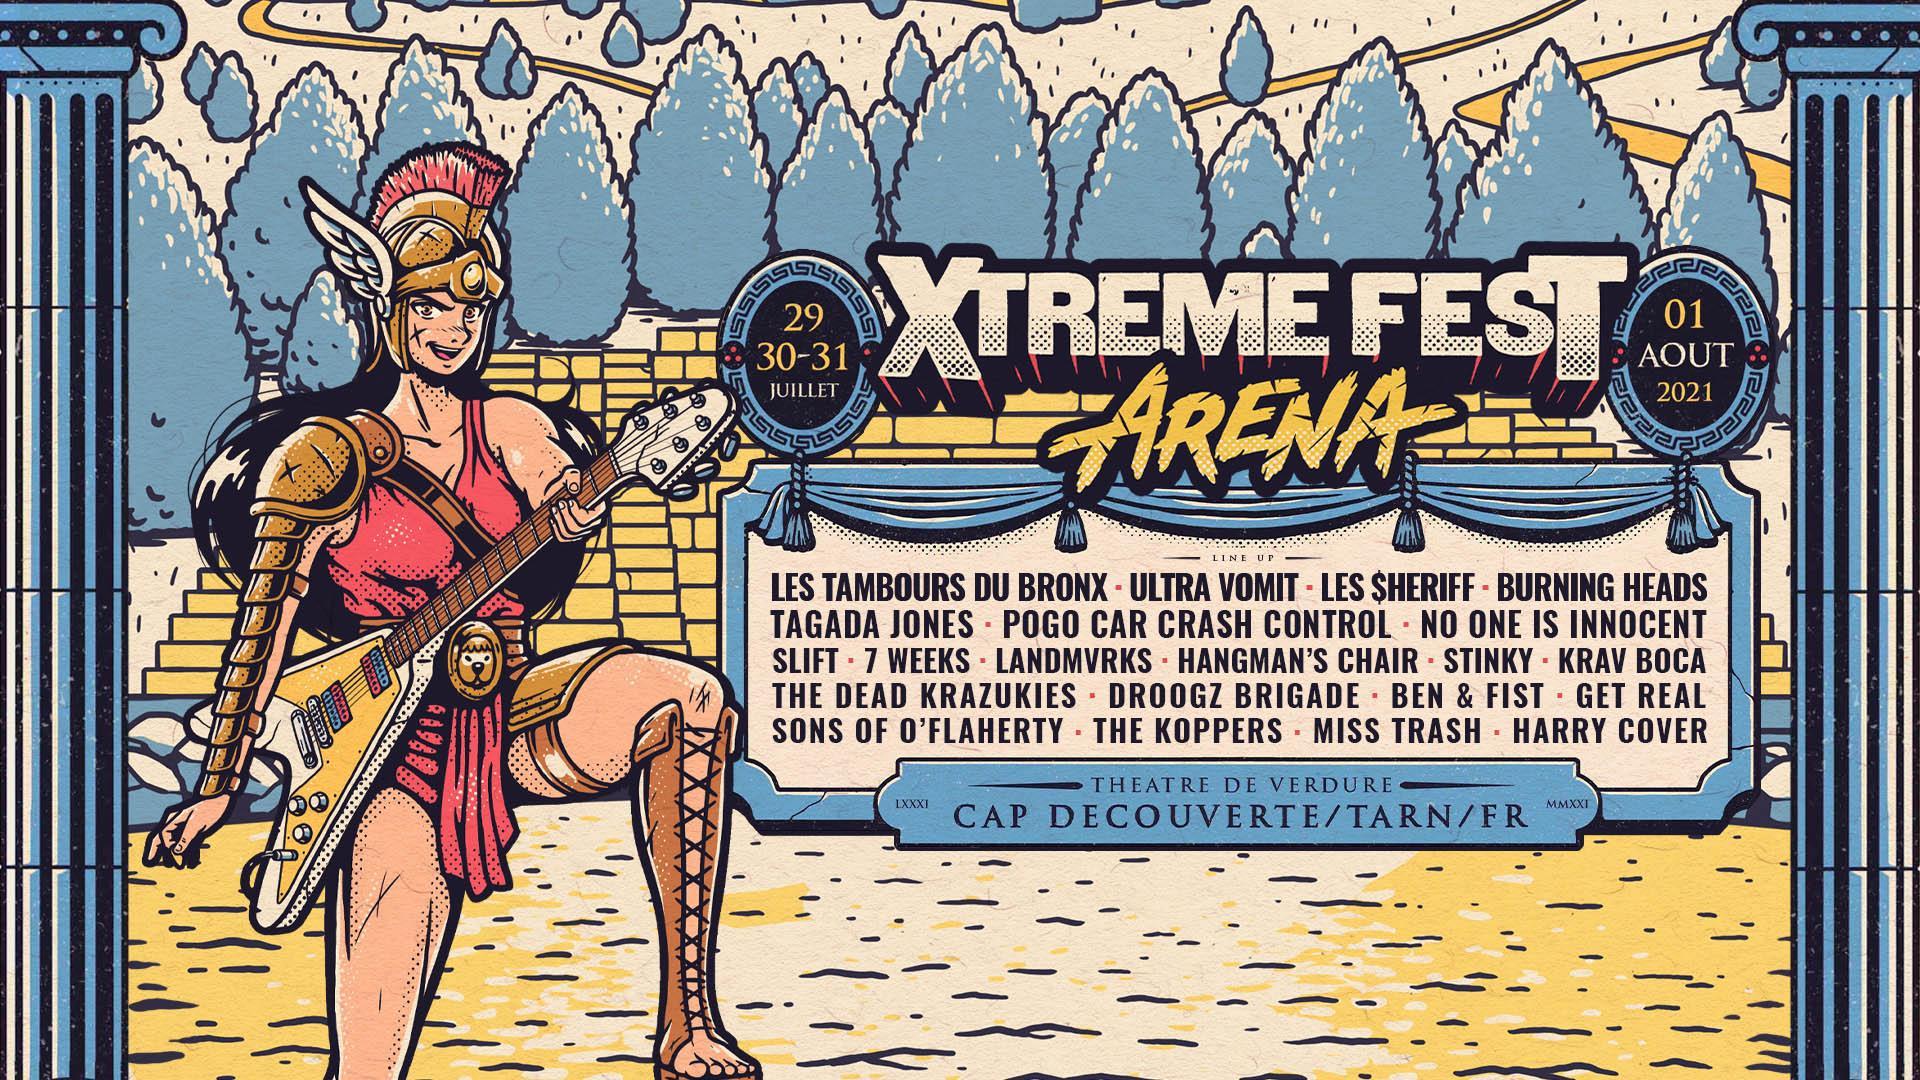 Xtreme fest arena 2021